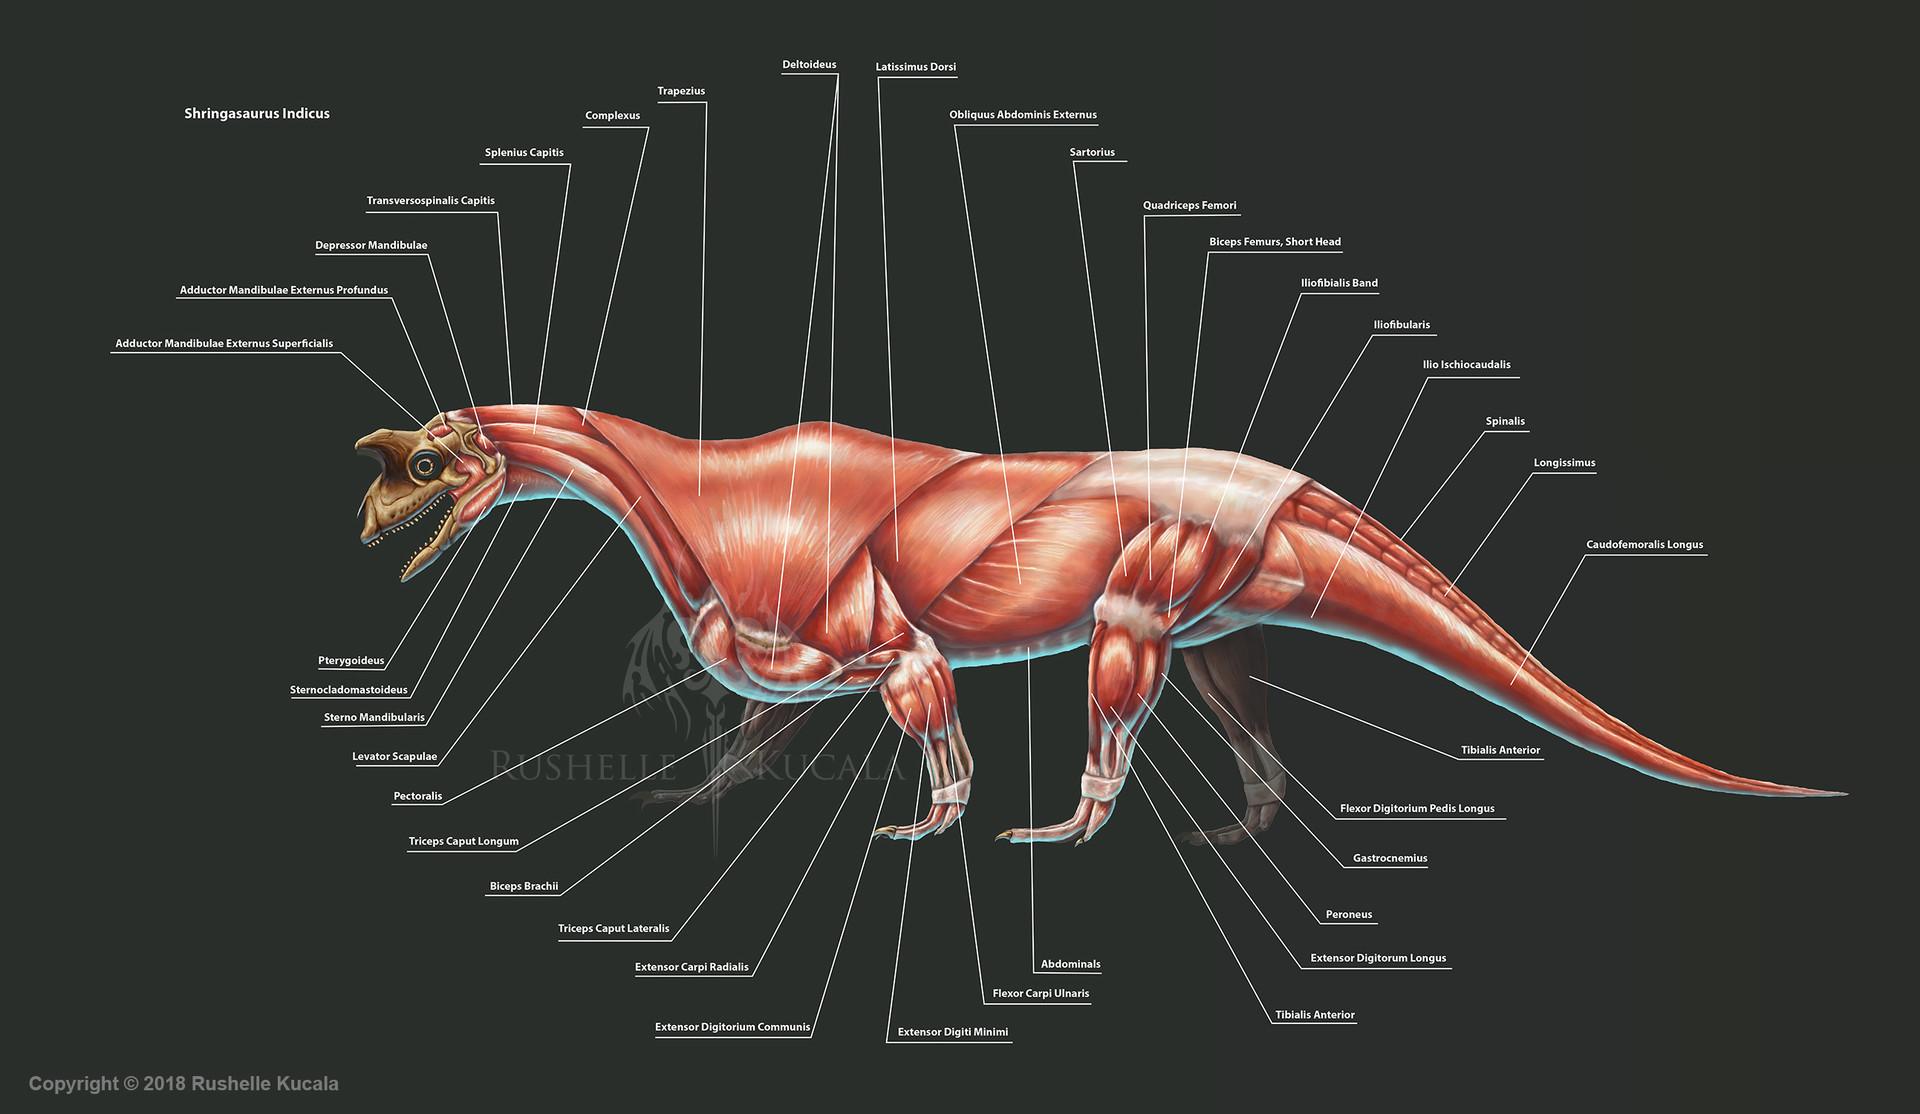 rushelle-kucala-shringasaurusindicusmusc